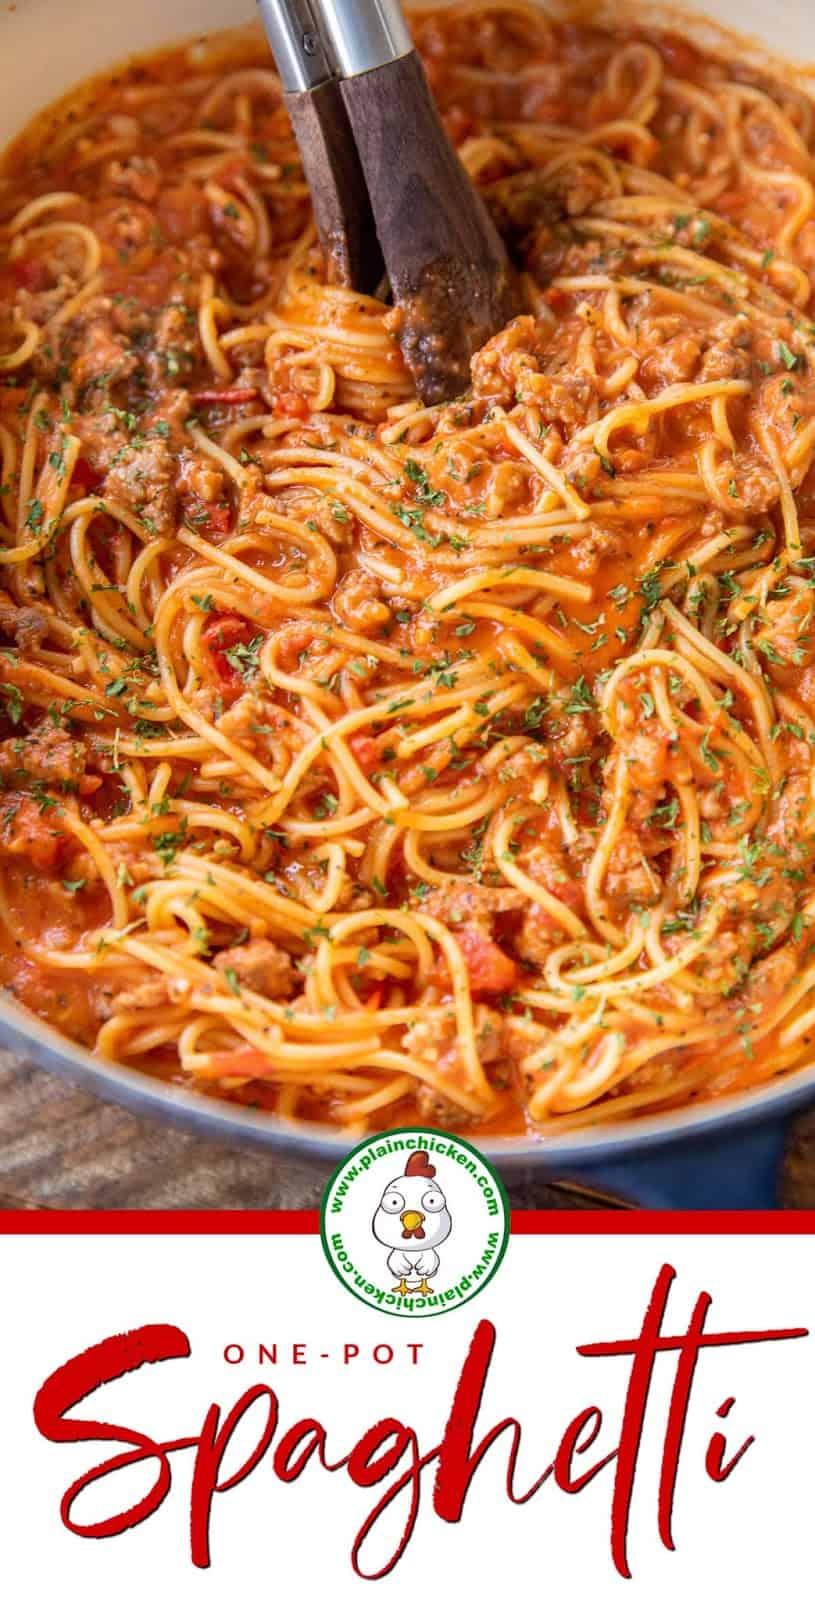 sauce pan full of spaghetti and sauce